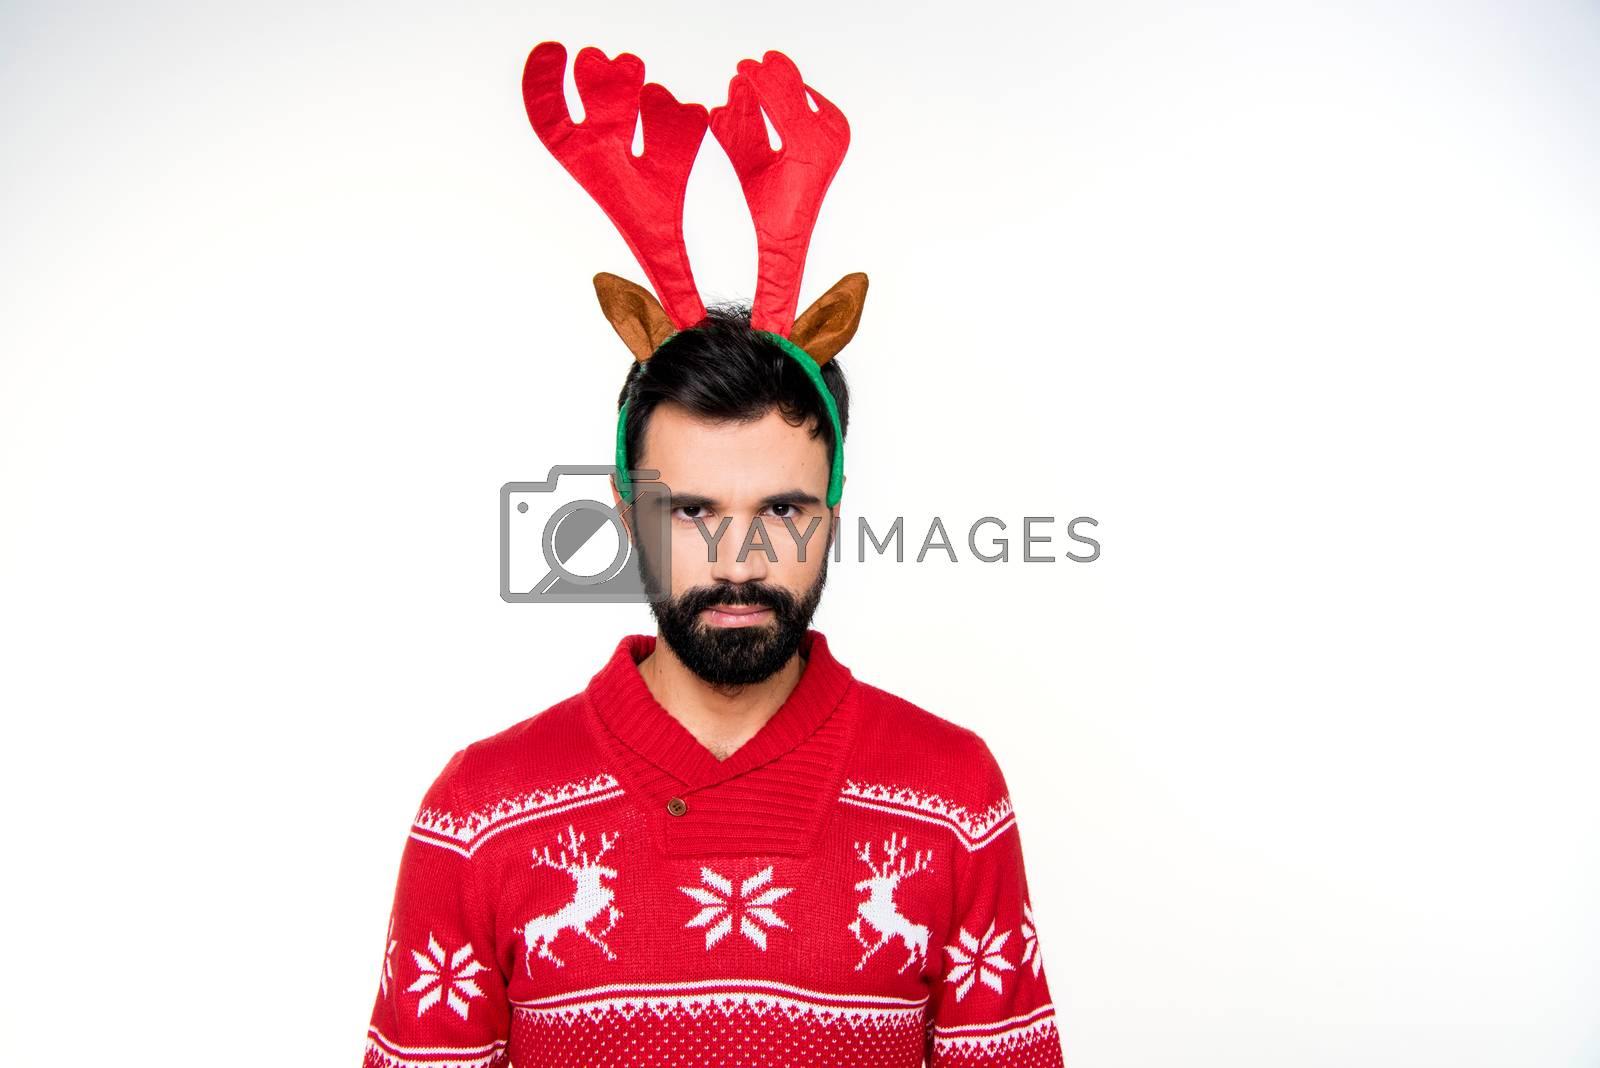 Serious bearded man in reindeer antlers headband looking at camera on white